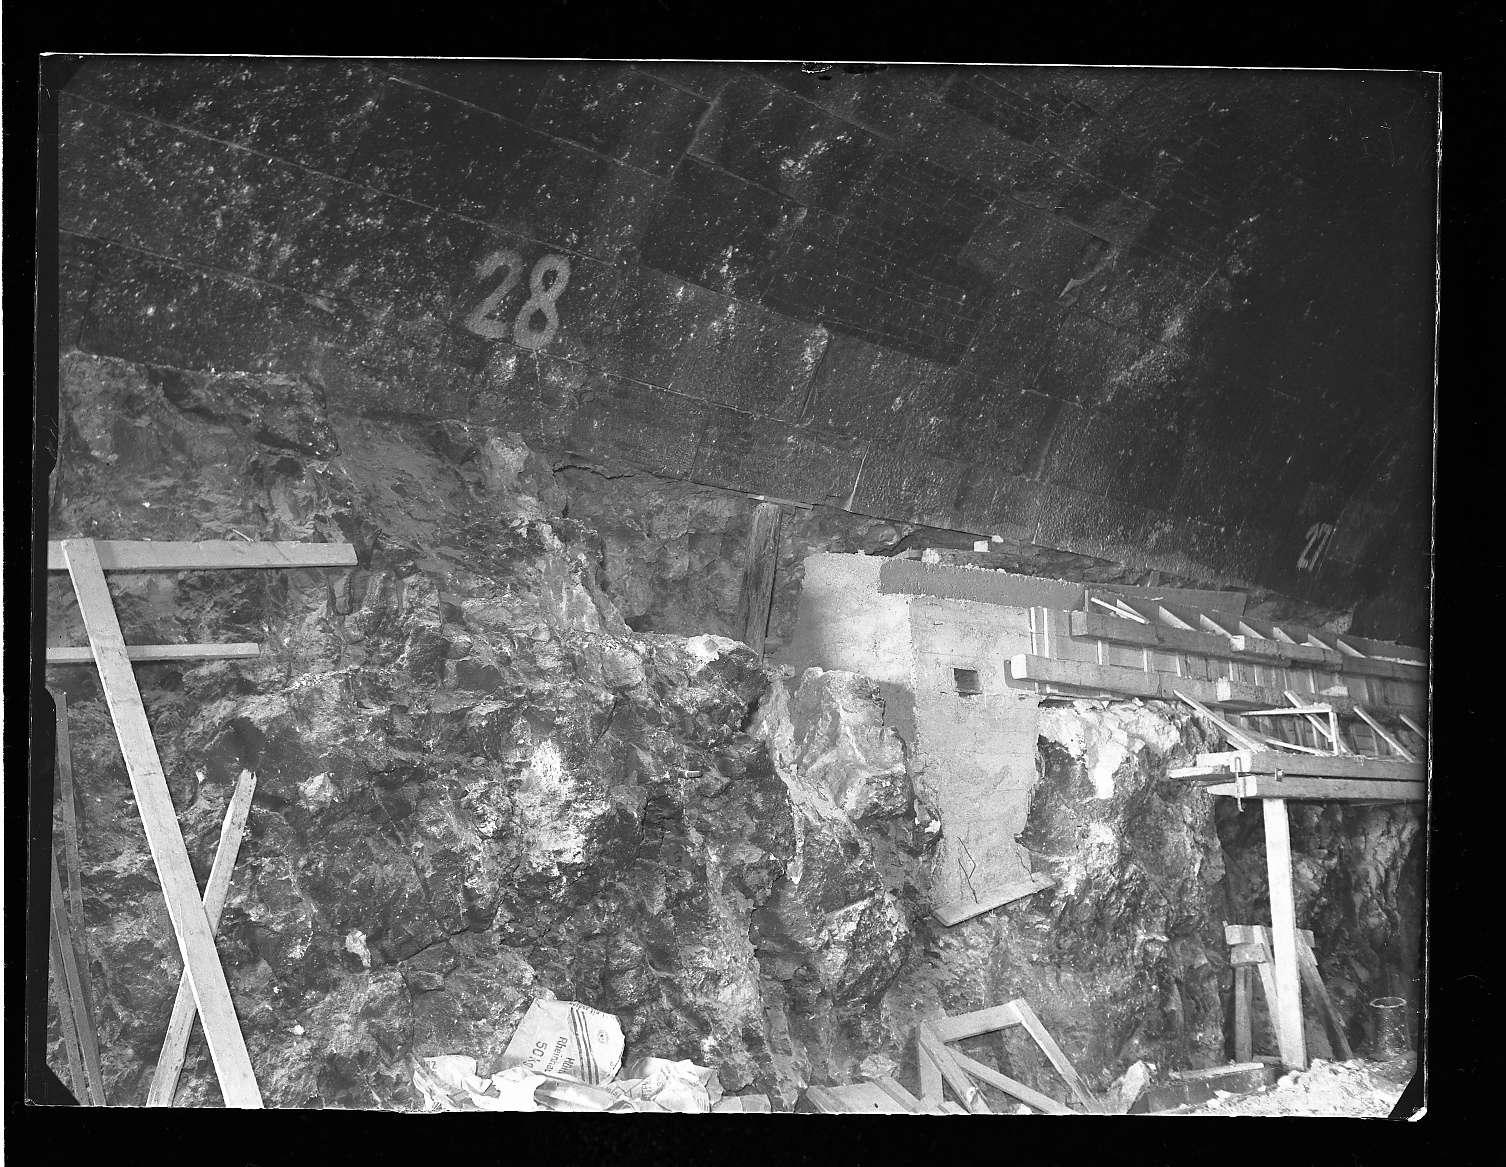 Itzelberg, Bf, Tunnelausbau und Abdichtung (Innenaufnahmen), Abb. b